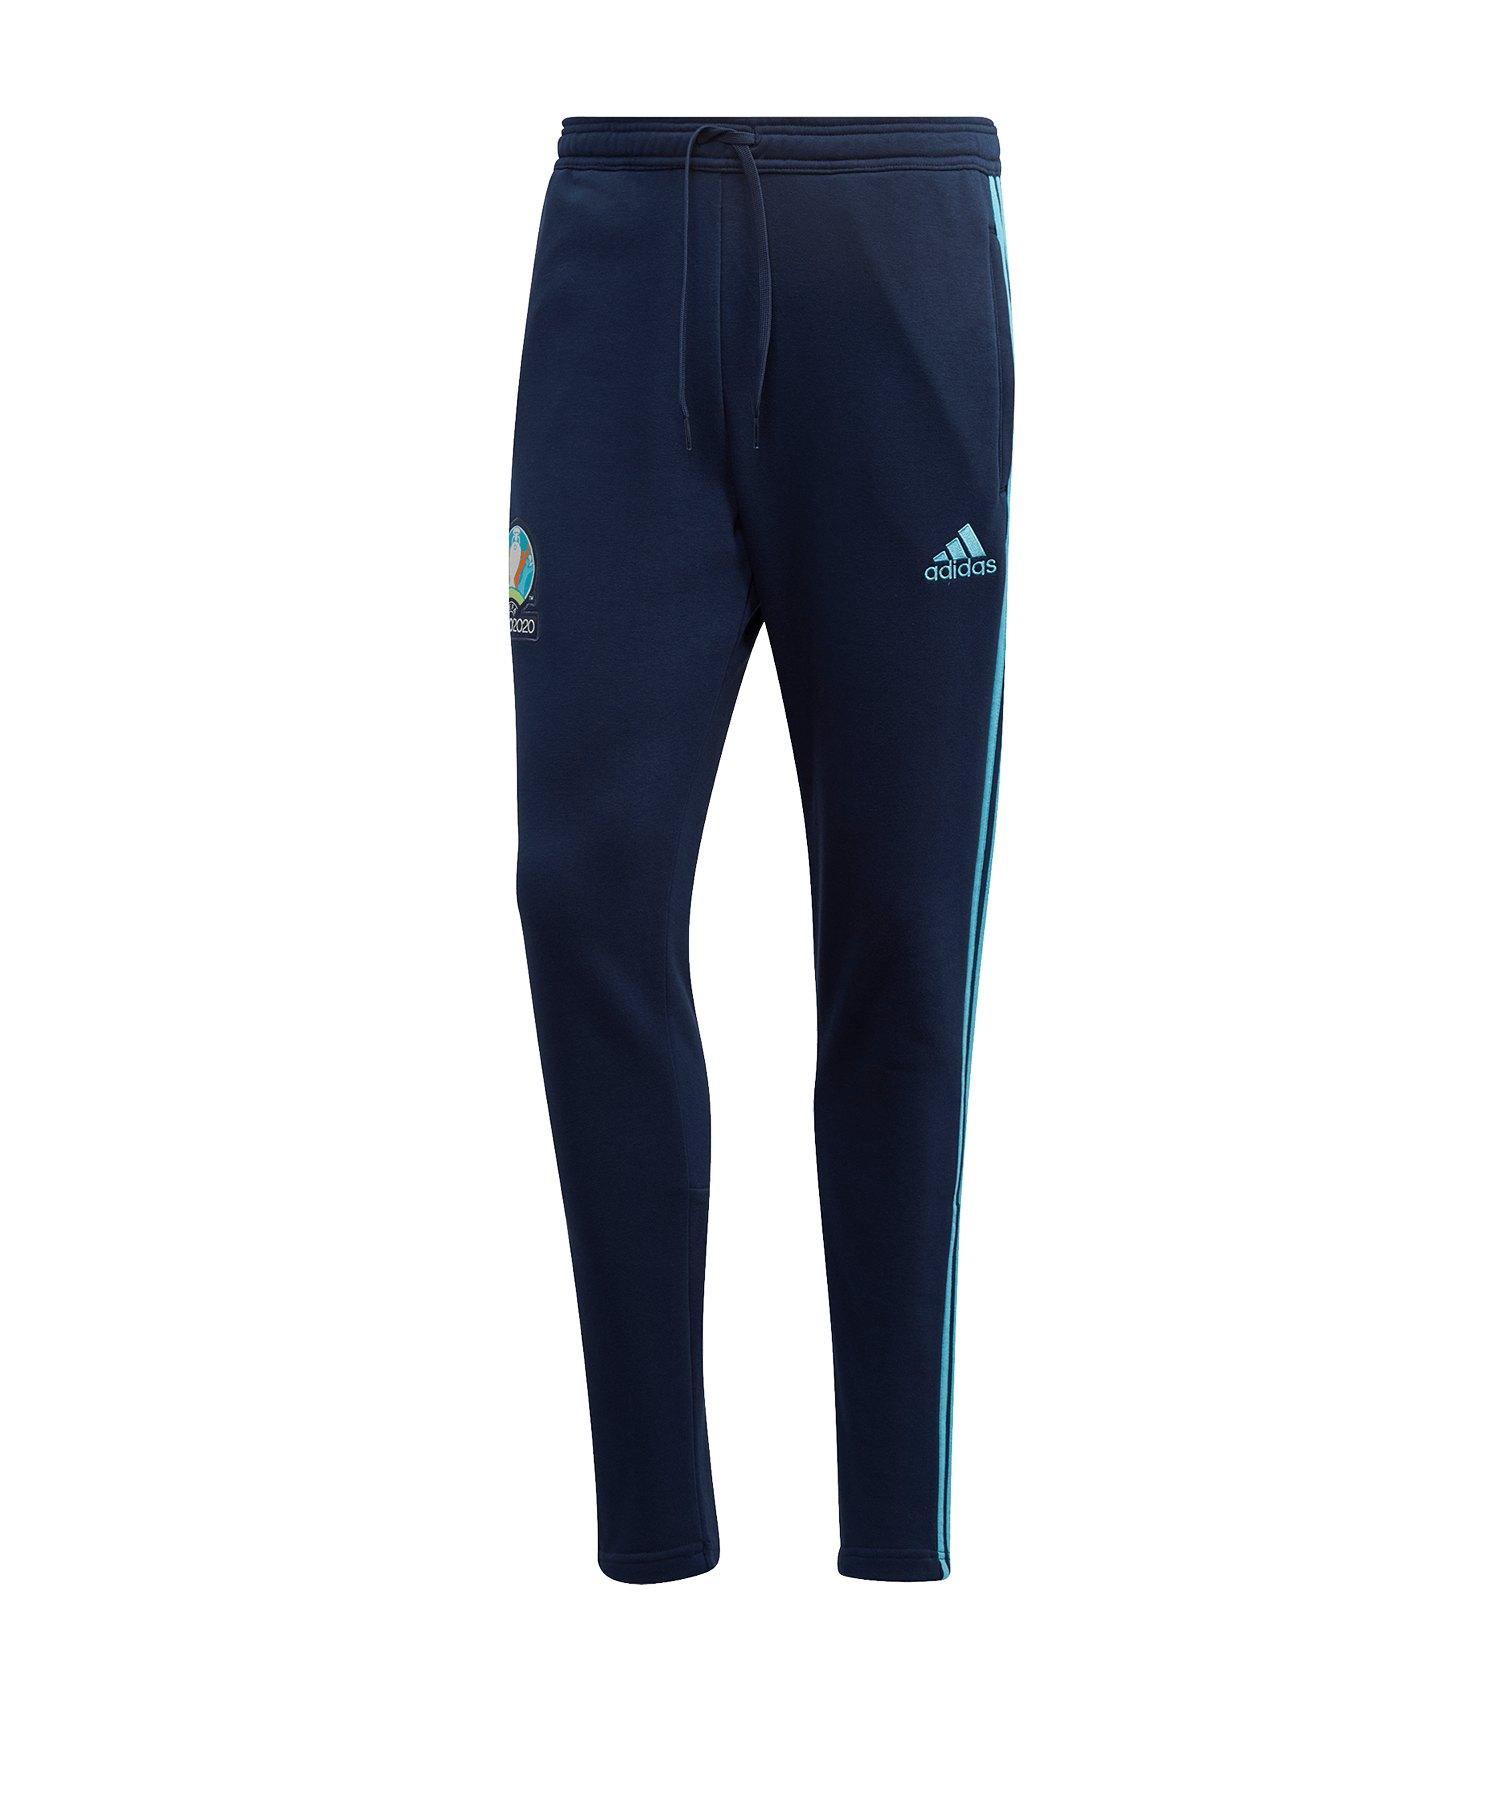 adidas UEFA EM 2020 Trainingshose Blau - blau